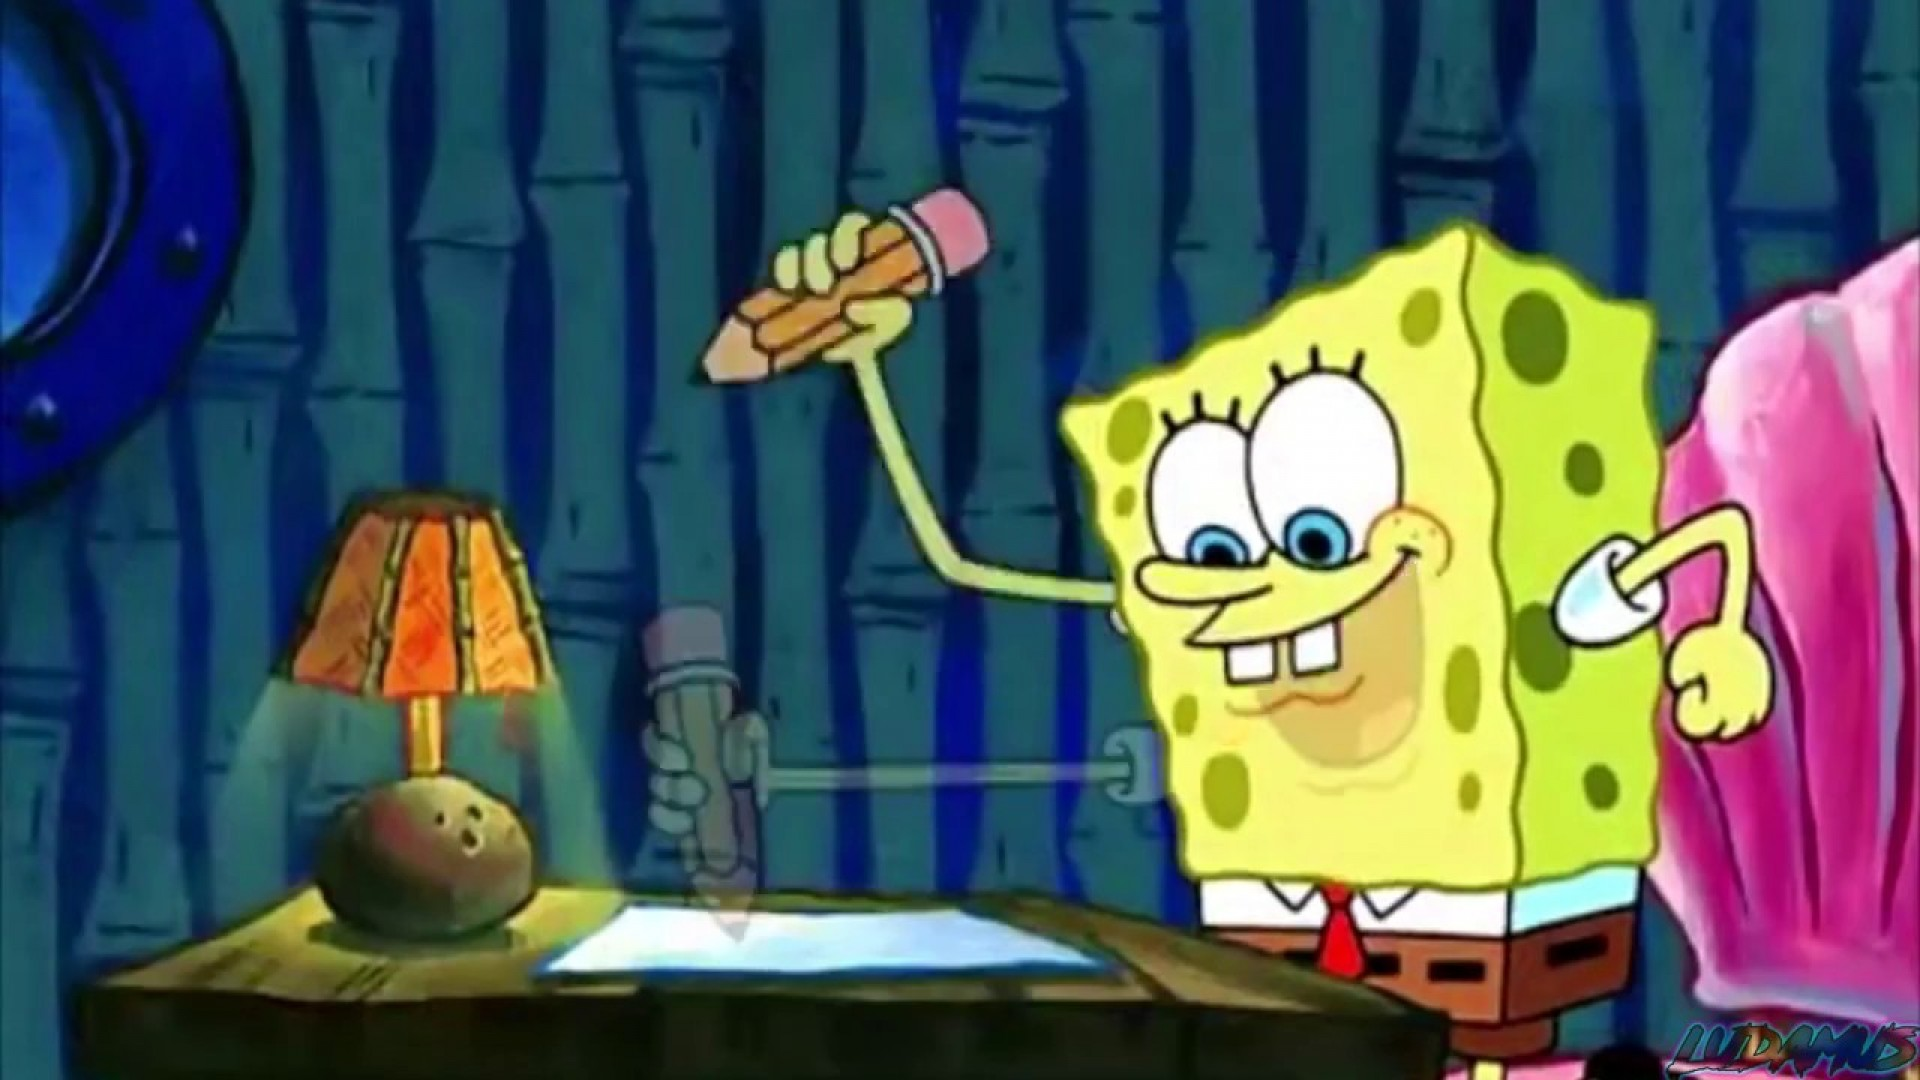 015 Essay Example Spongebob Meme Writing His Term Paper Help Bkhomeworkqvci Dedup Info Maxresde Stirring Font Generator 1920